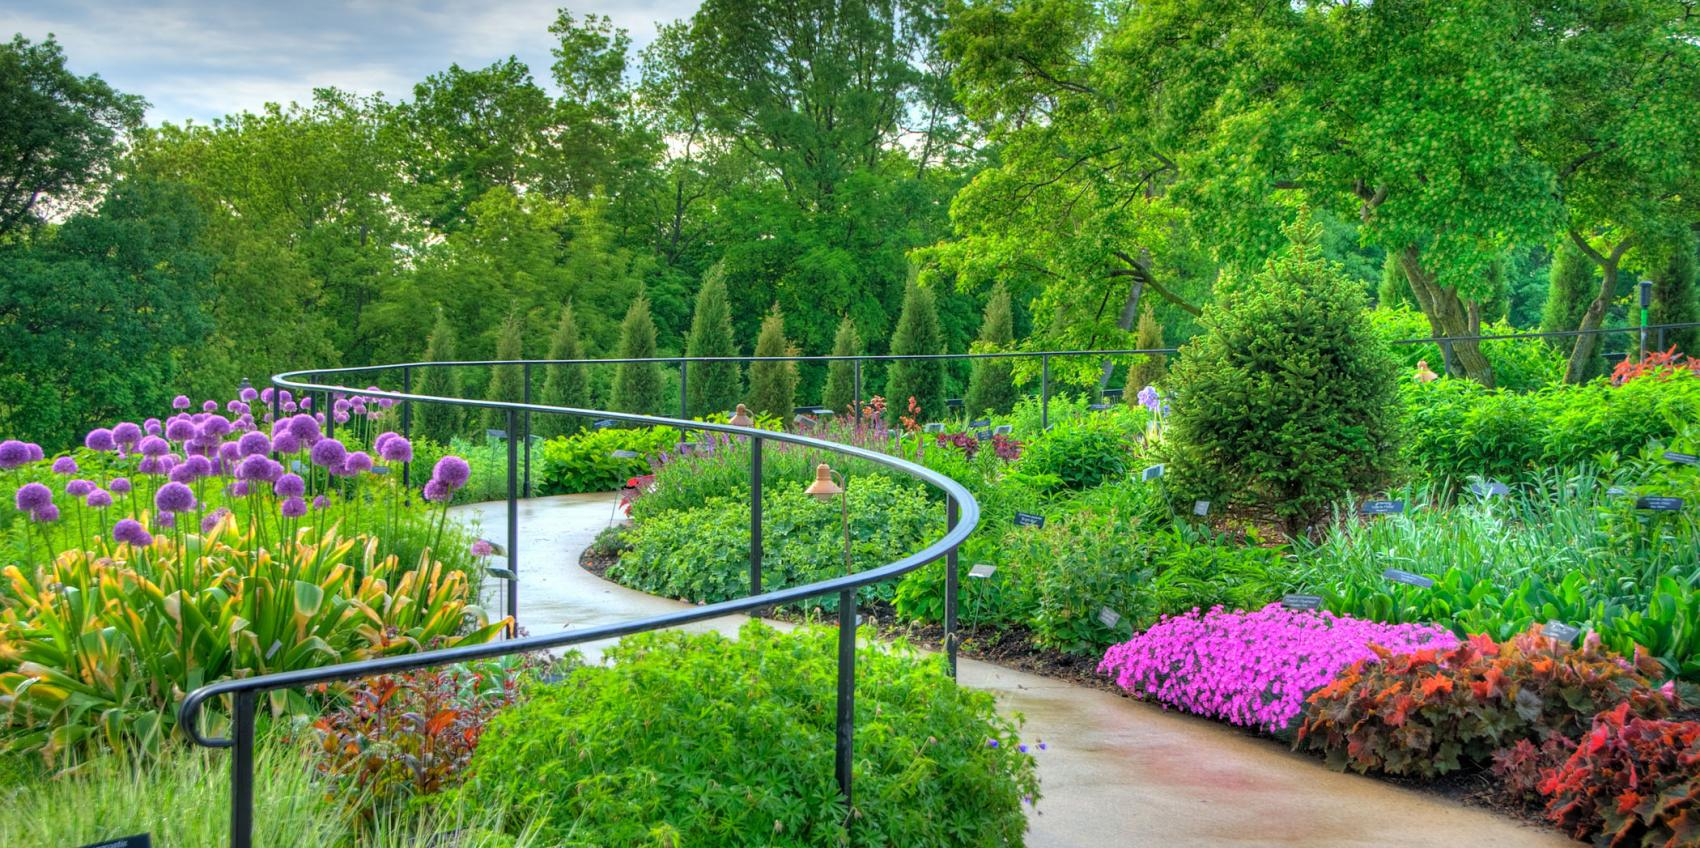 Minnesota Landscape Arboretum American Public Gardens Association